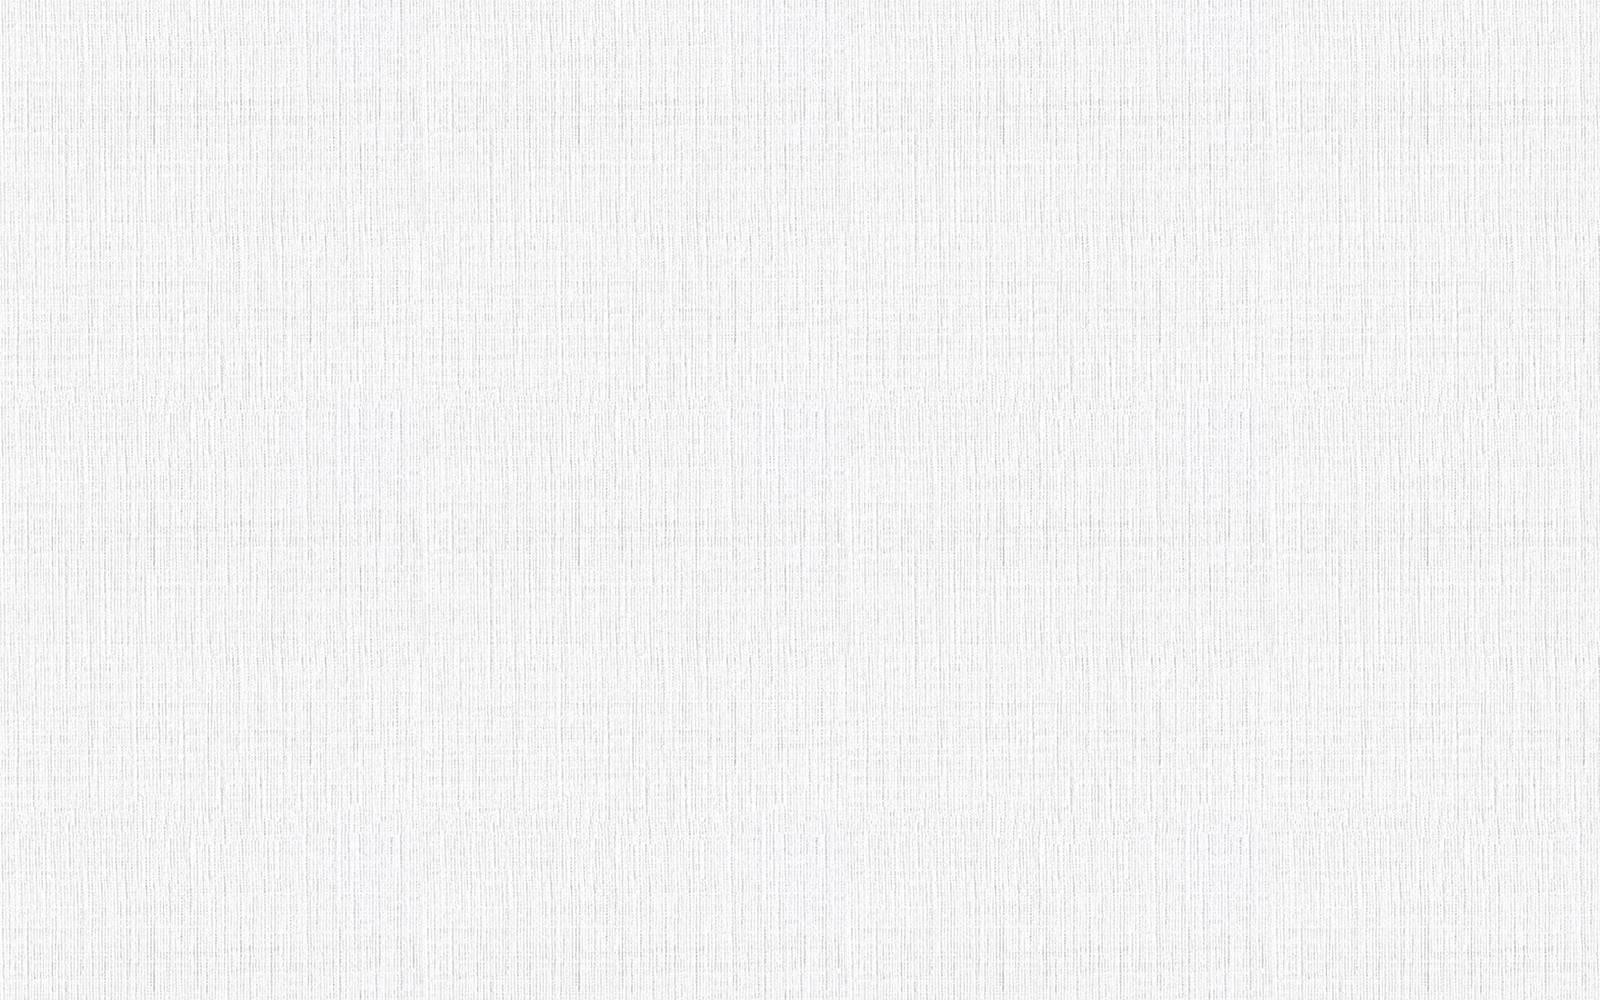 white linen background